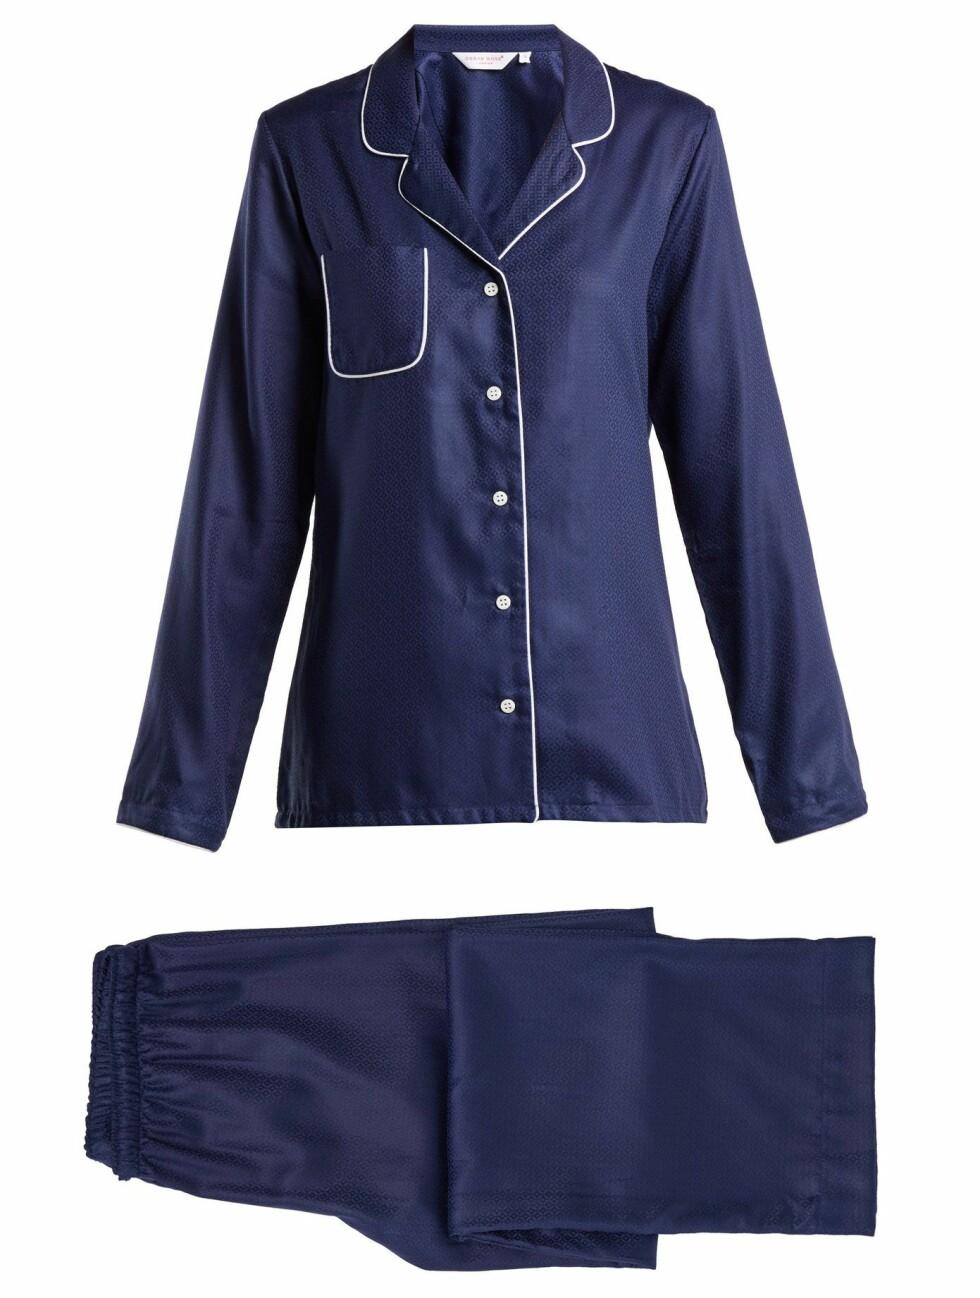 Pysj fra Derek Rose |1485,-| https://www.matchesfashion.com/intl/products/Derek-Rose-Lombard-6-cotton-pyjama-set-1207674